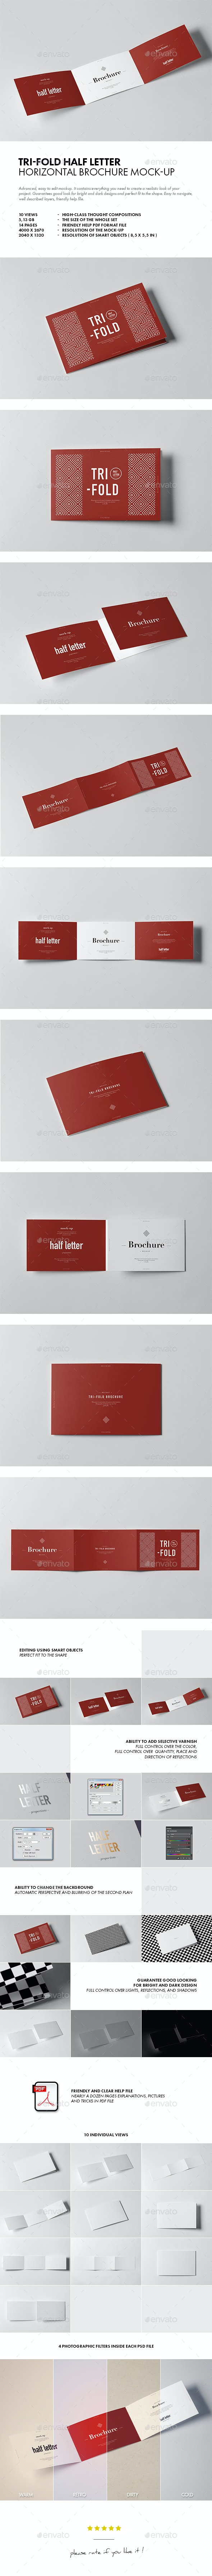 Tri-Fold Half Letter Horizontal Brochure Mock-up - Brochures Print